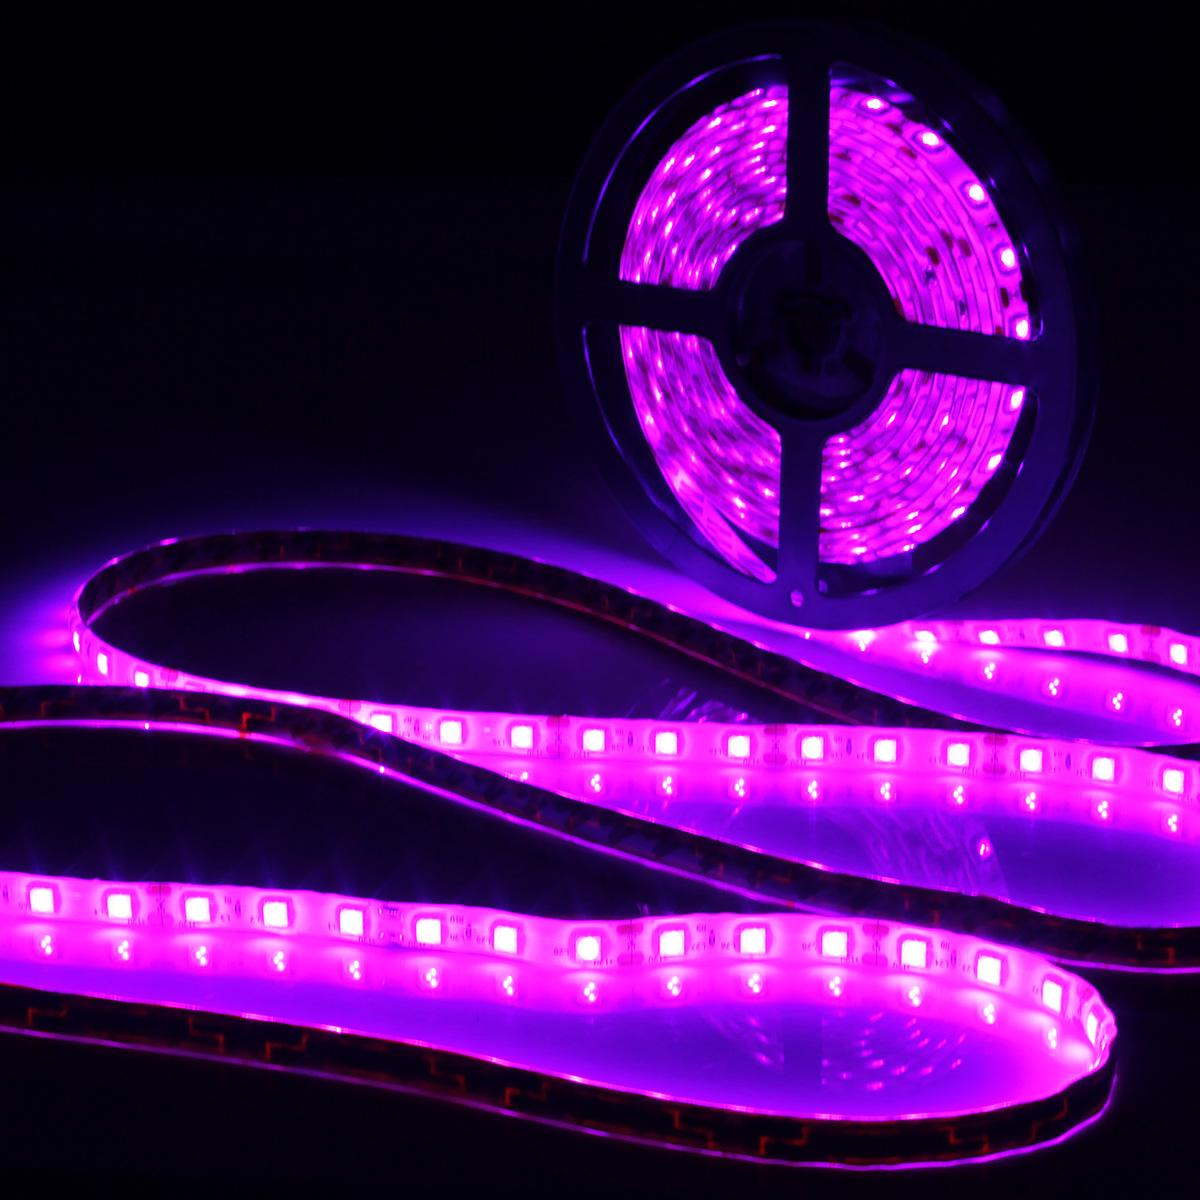 0.5/1/2/3/4/5M Waterproof IP65 UV Lamp Ultraviolet Purple Led Strip Light 12V DC 5050 SMD Black LED Lamp 395-405nm Strip Light